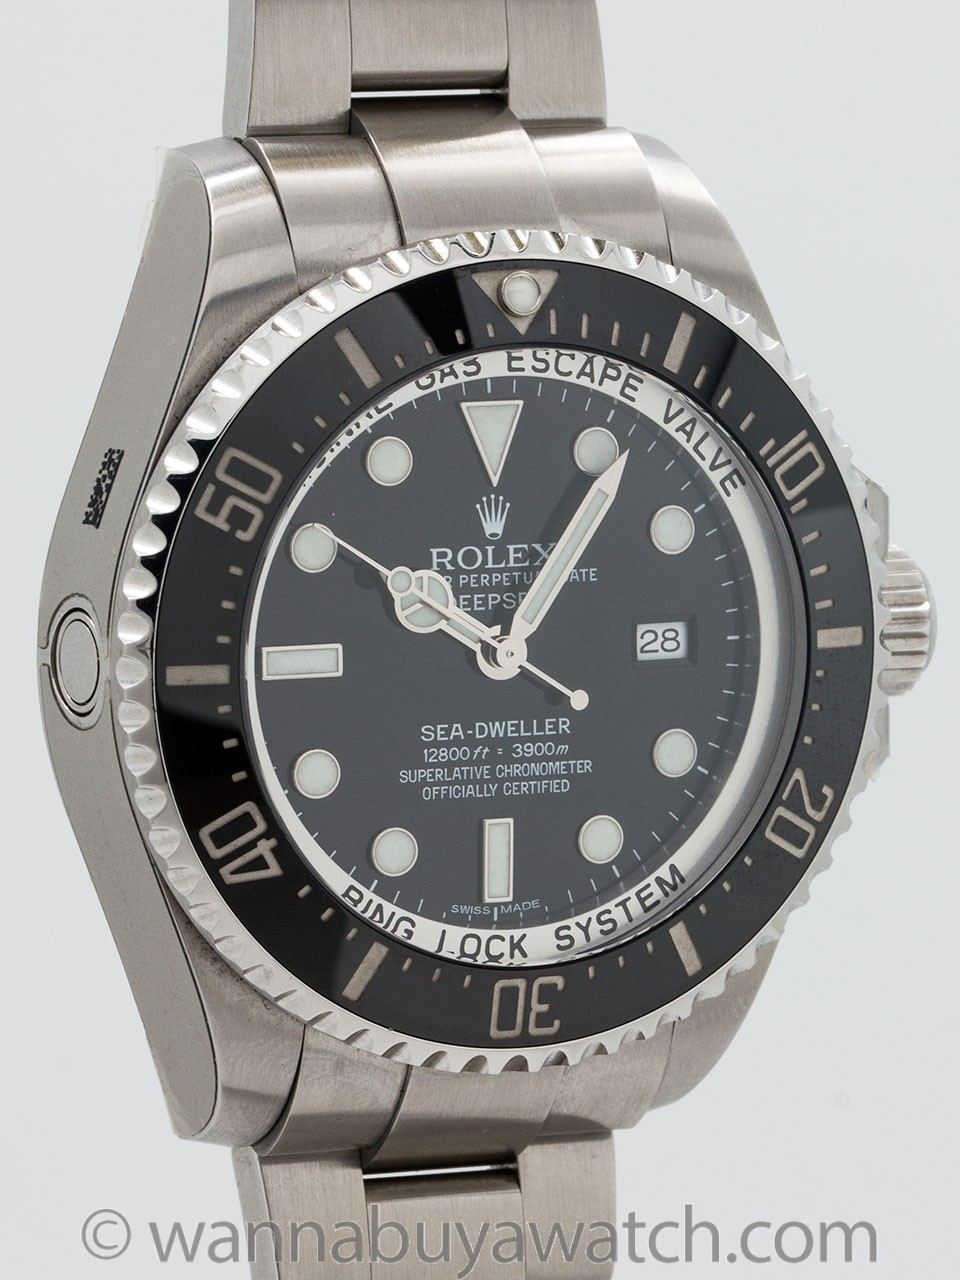 Rolex Seadweller Deep Sea ref 116660 Stainless Steel circa 2011